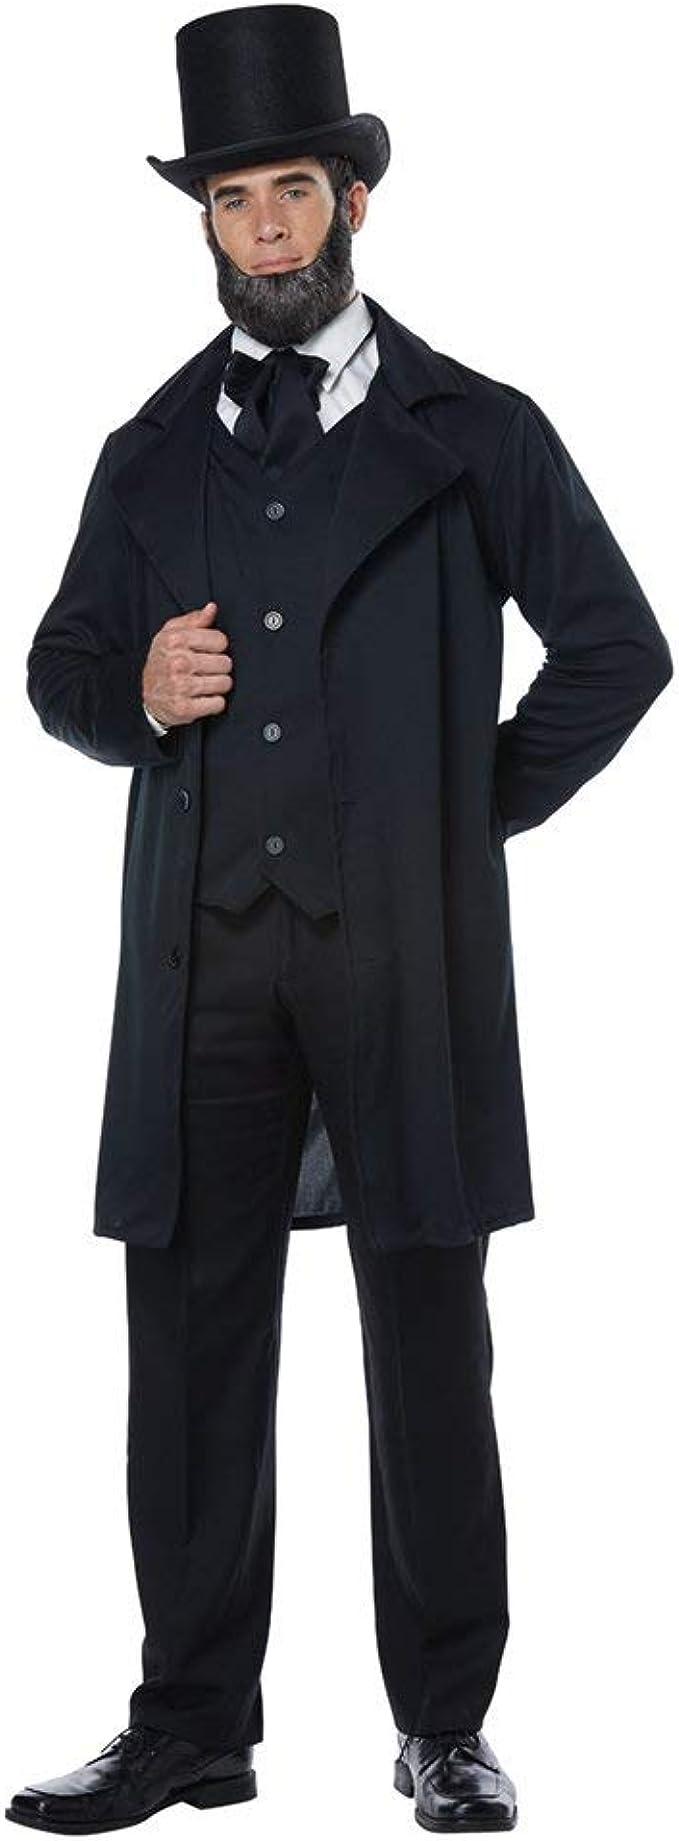 Victorian Men's Costumes: Mad Hatter, Rhet Butler, Willy Wonka Adult Abraham Lincoln Costume $55.50 AT vintagedancer.com